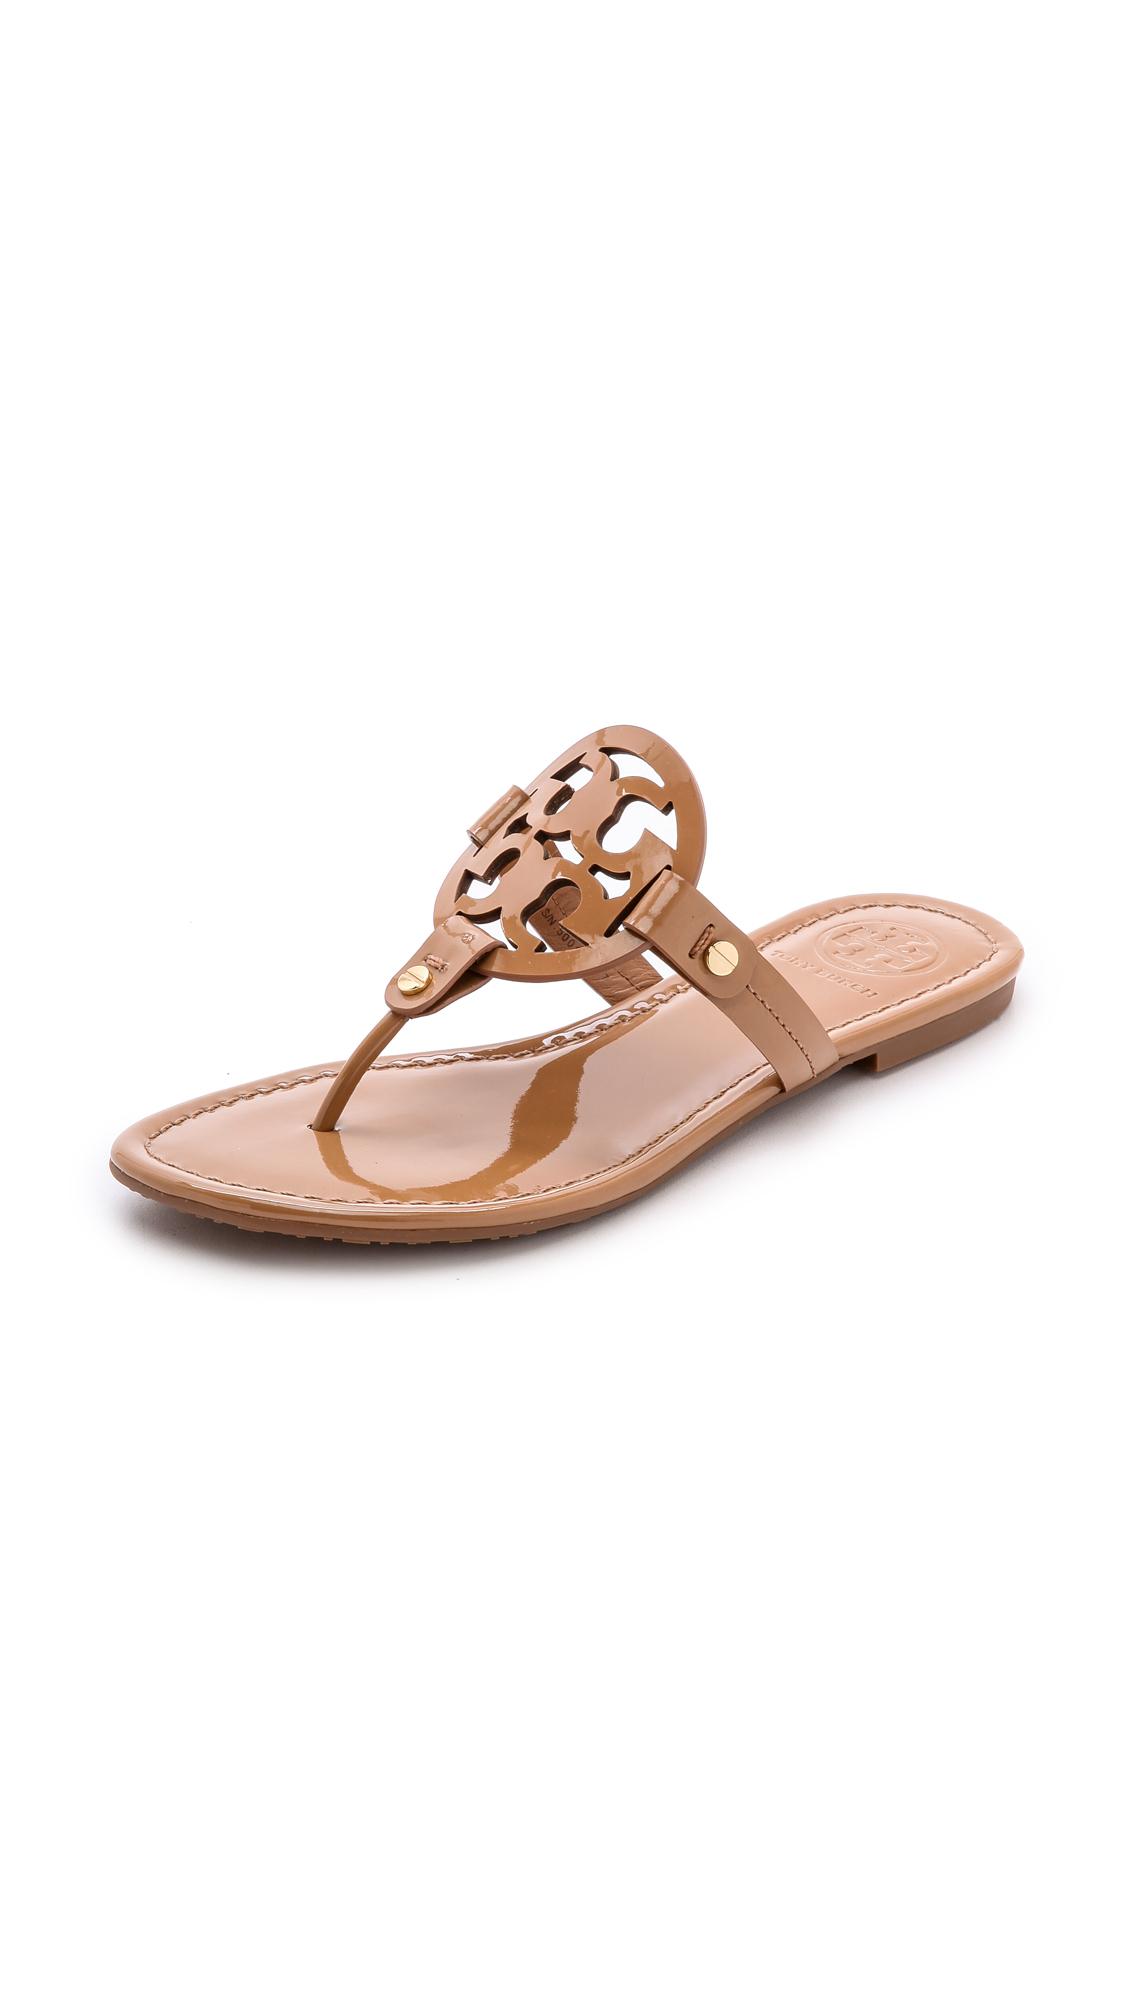 tory burch female tory burch miller thong sandals sand